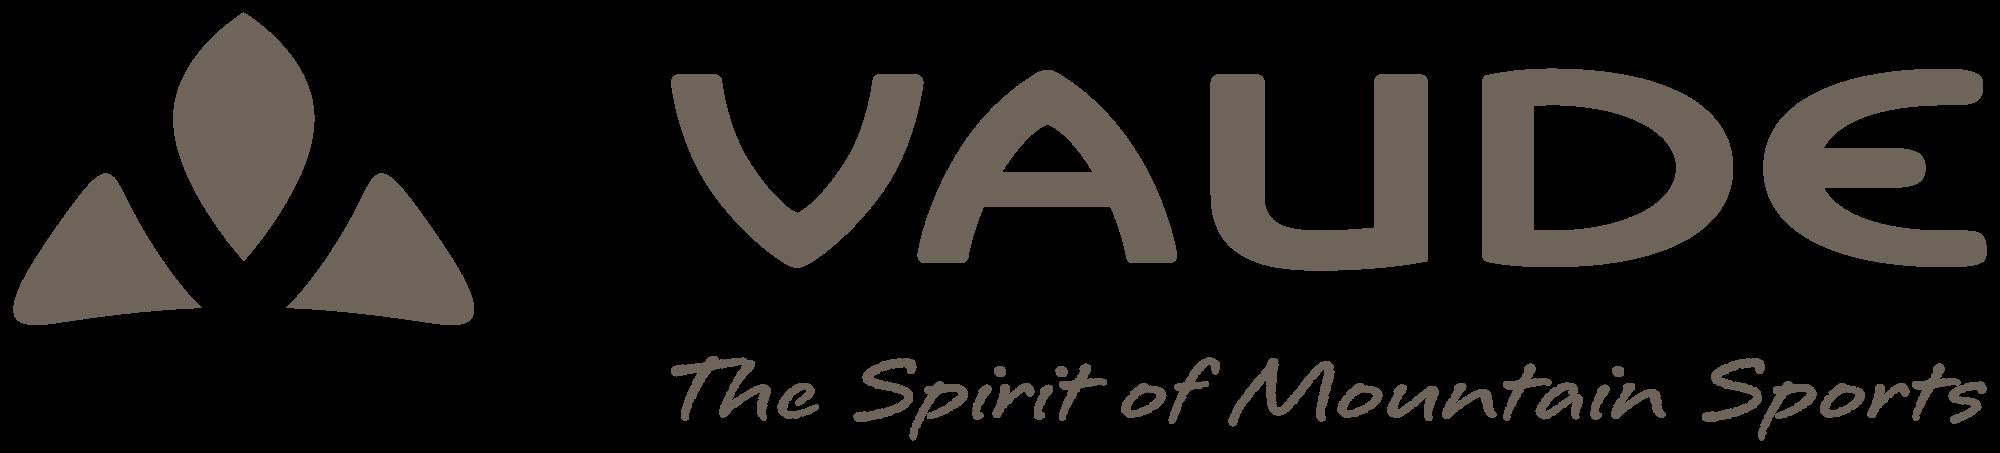 Vaude-Logo-2012.svg.png